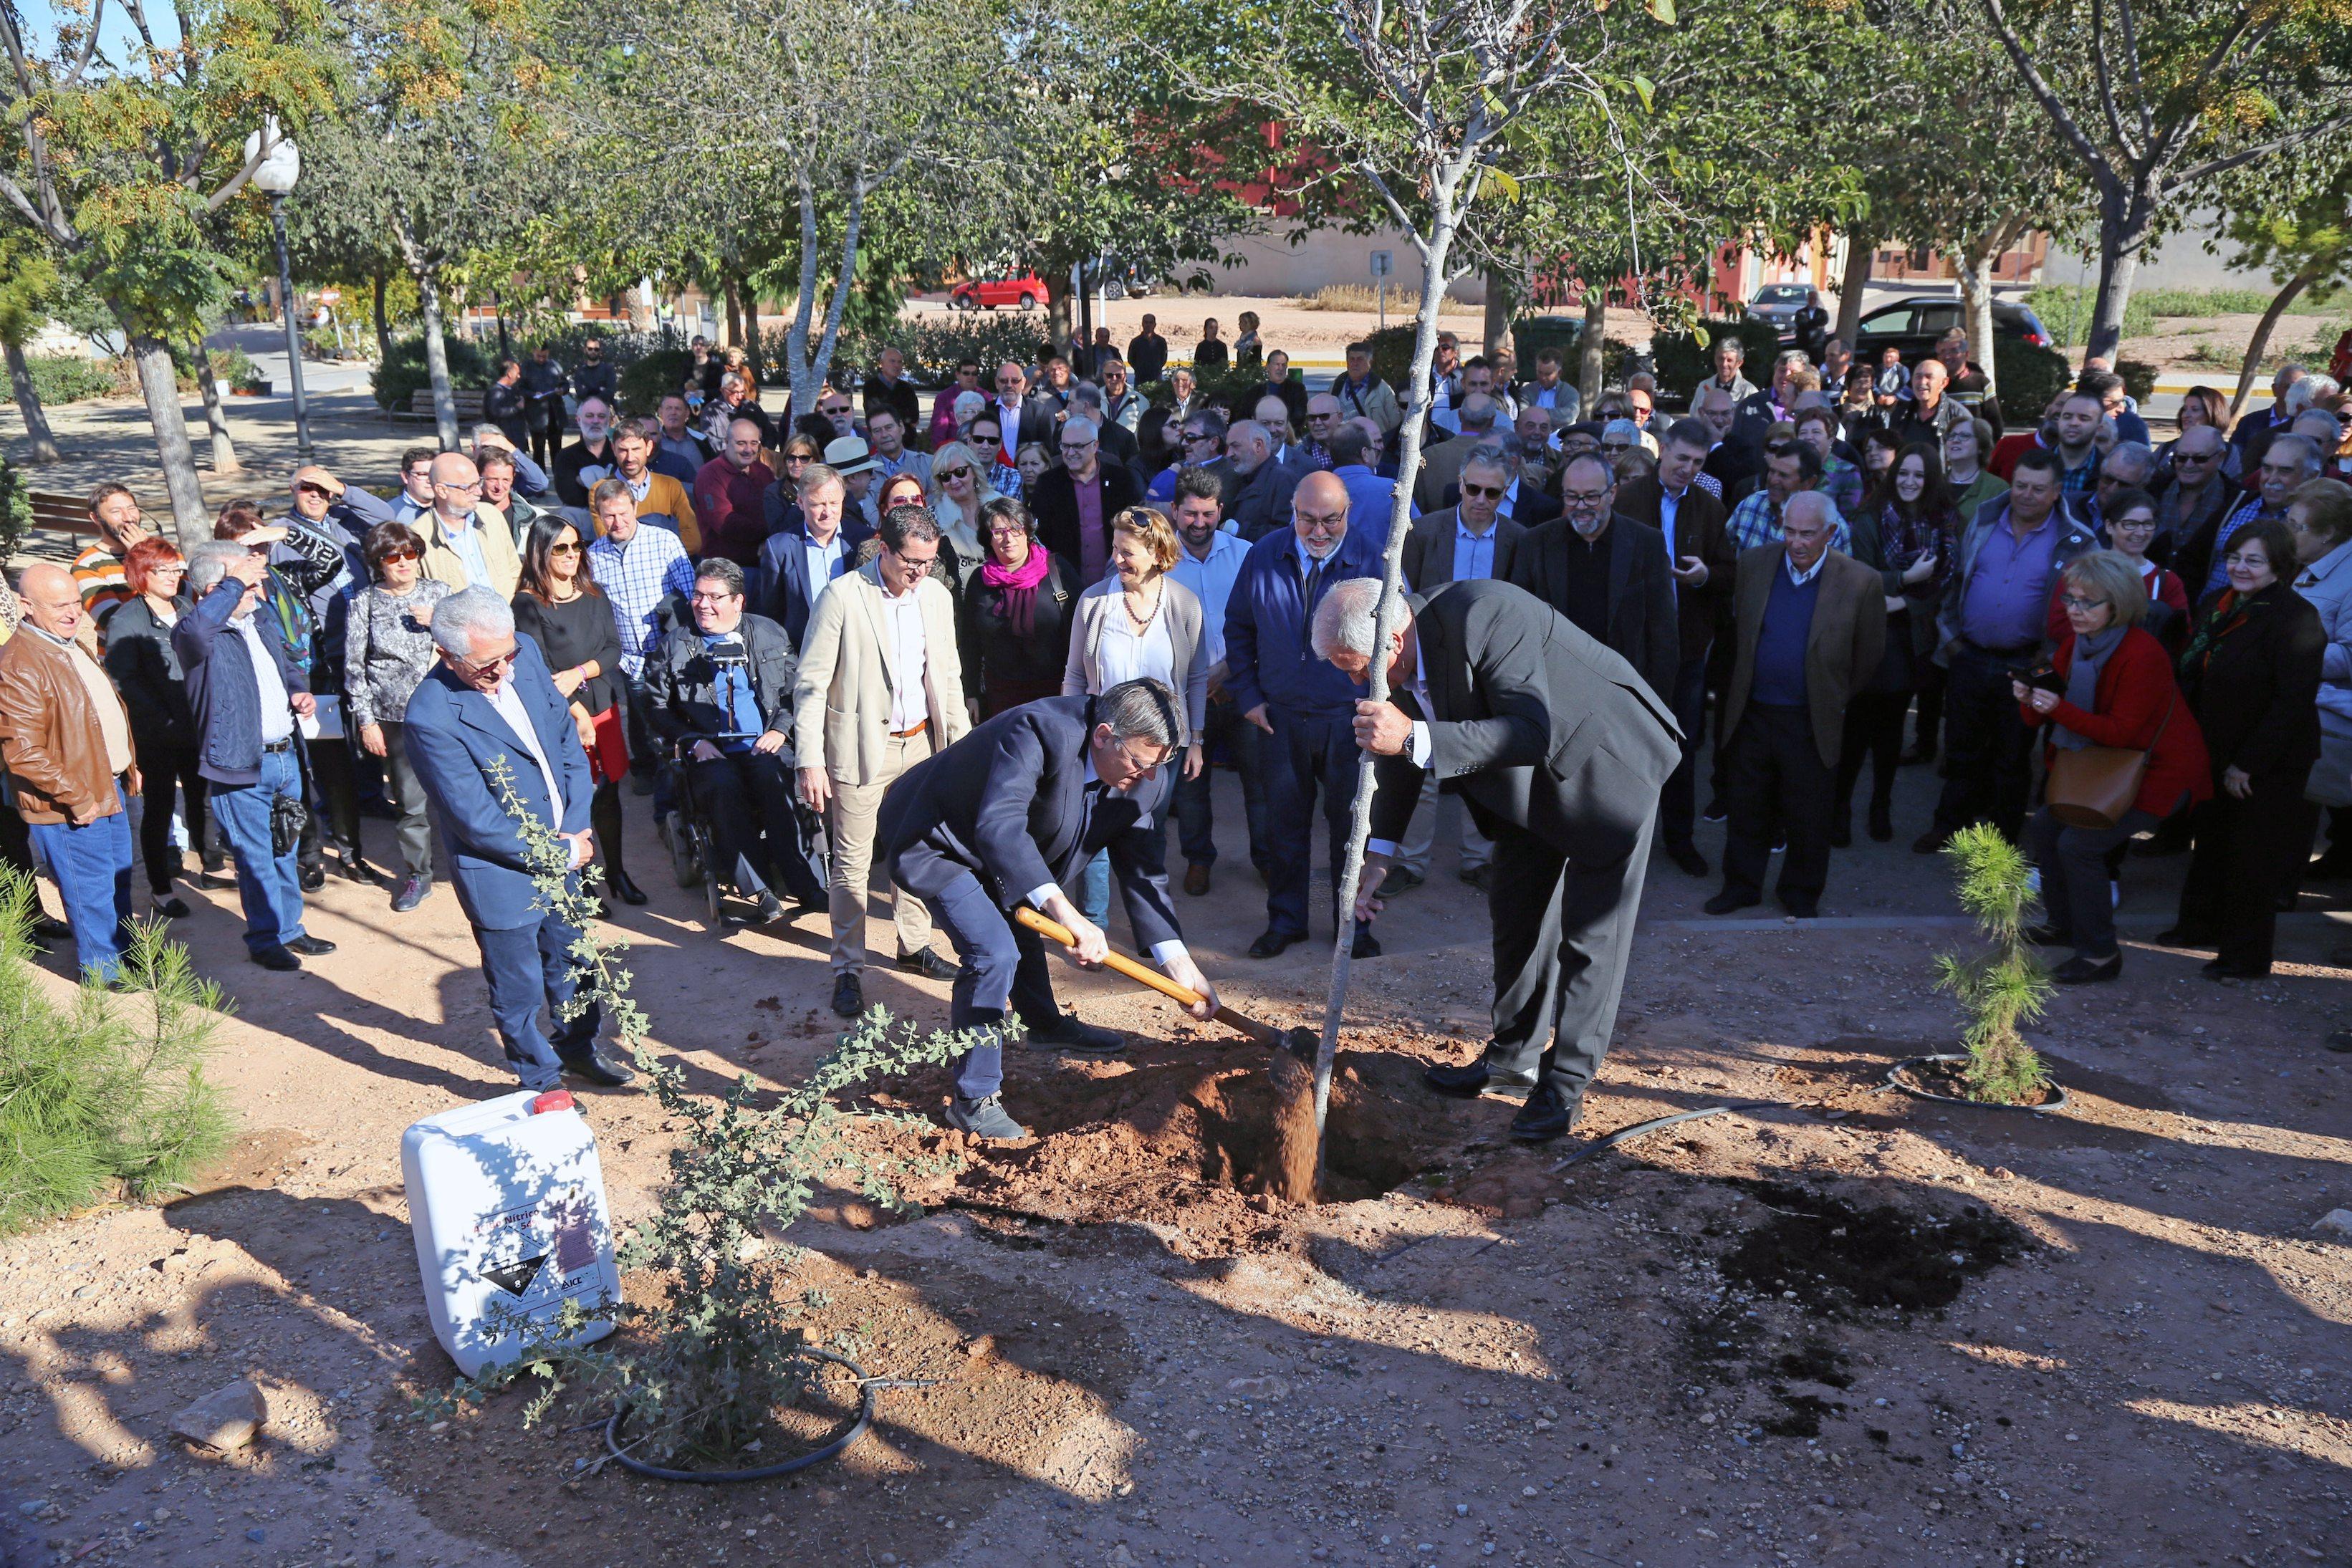 El President de la Generalitat junto al de La Unió durante un momento del acto.